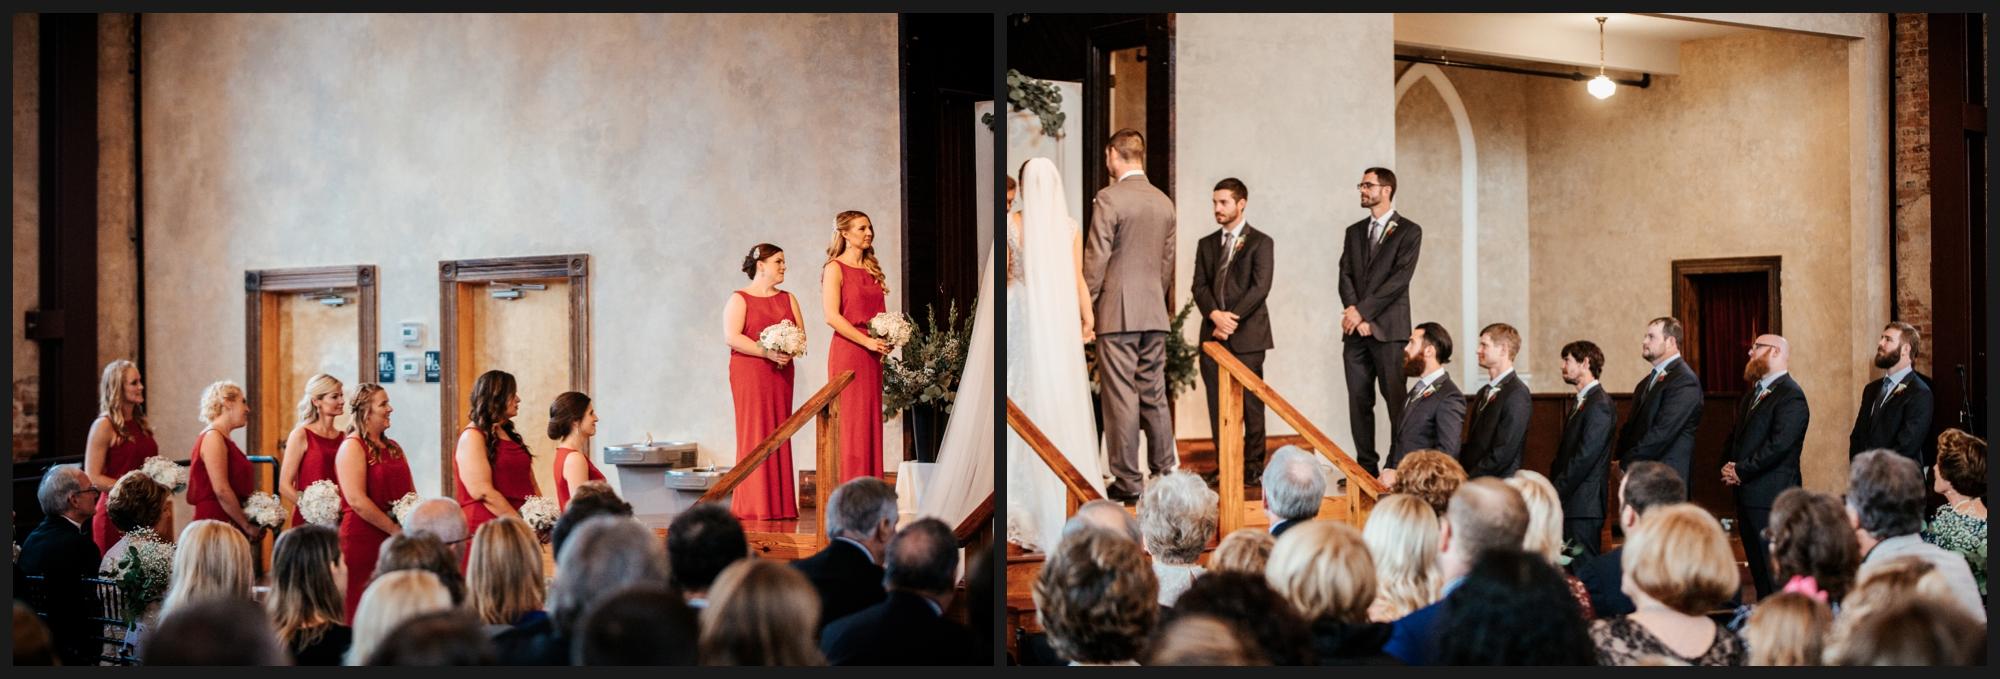 Orlando-Wedding-Photographer-destination-wedding-photographer-florida-wedding-photographer-bohemian-wedding-photographer_0560.jpg